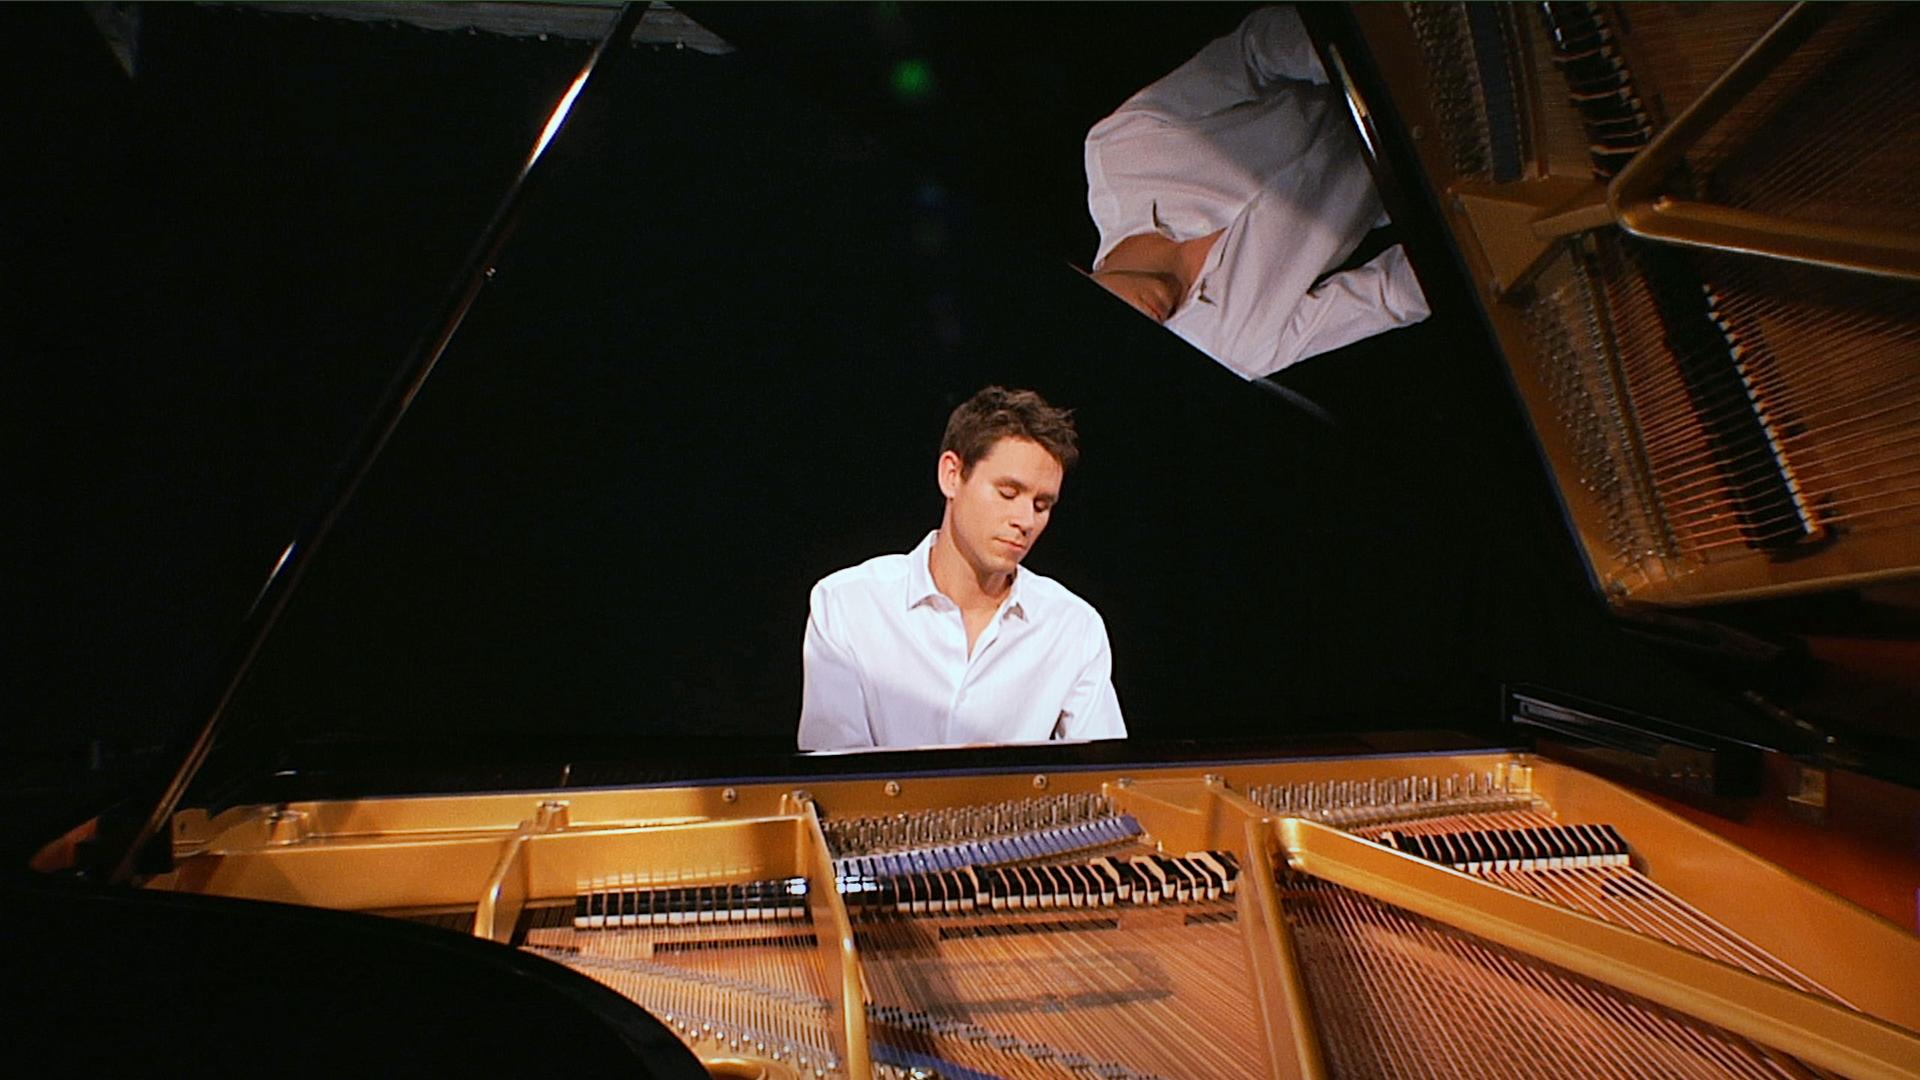 paul-spaeth-piano-white.png